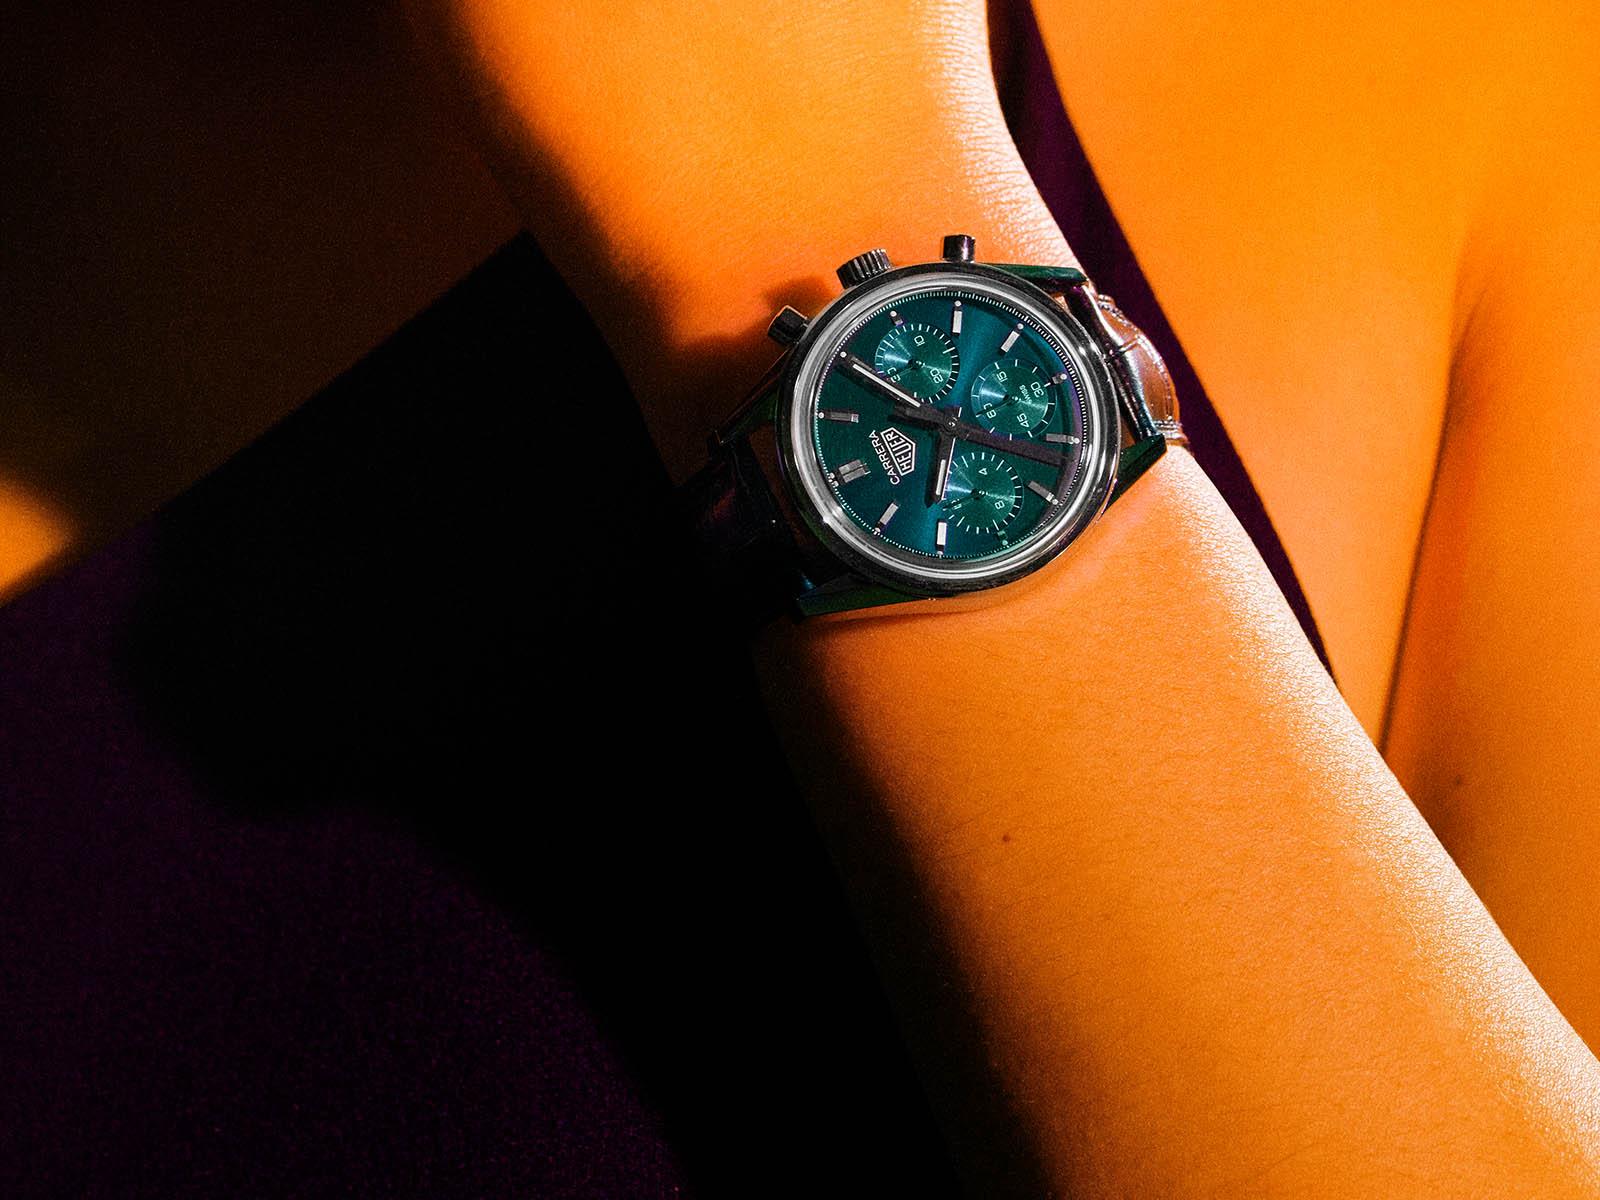 cbk221f-fc6479-tag-heuer-carrera-green-special-edition-8.jpg